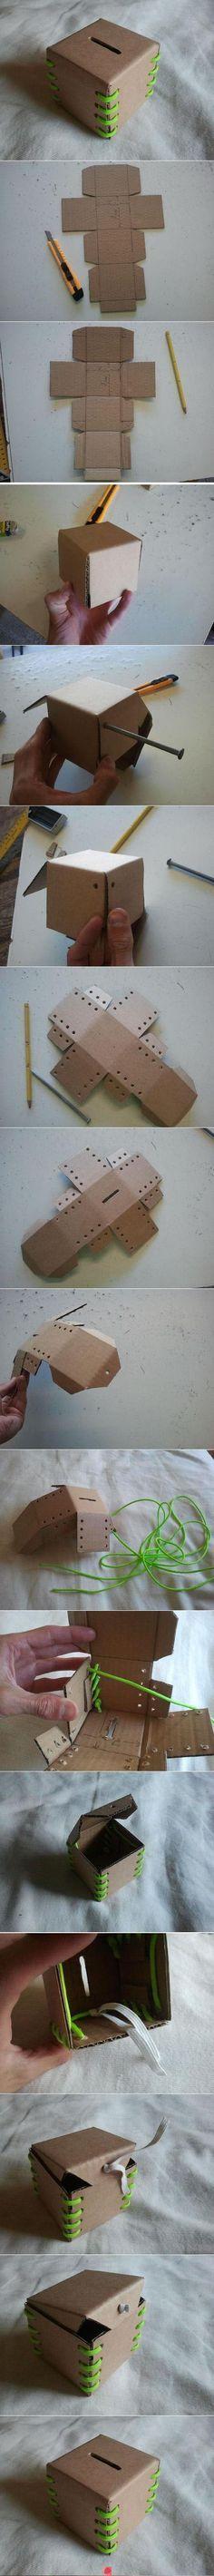 DIY Cardboard Lace-Up Bank